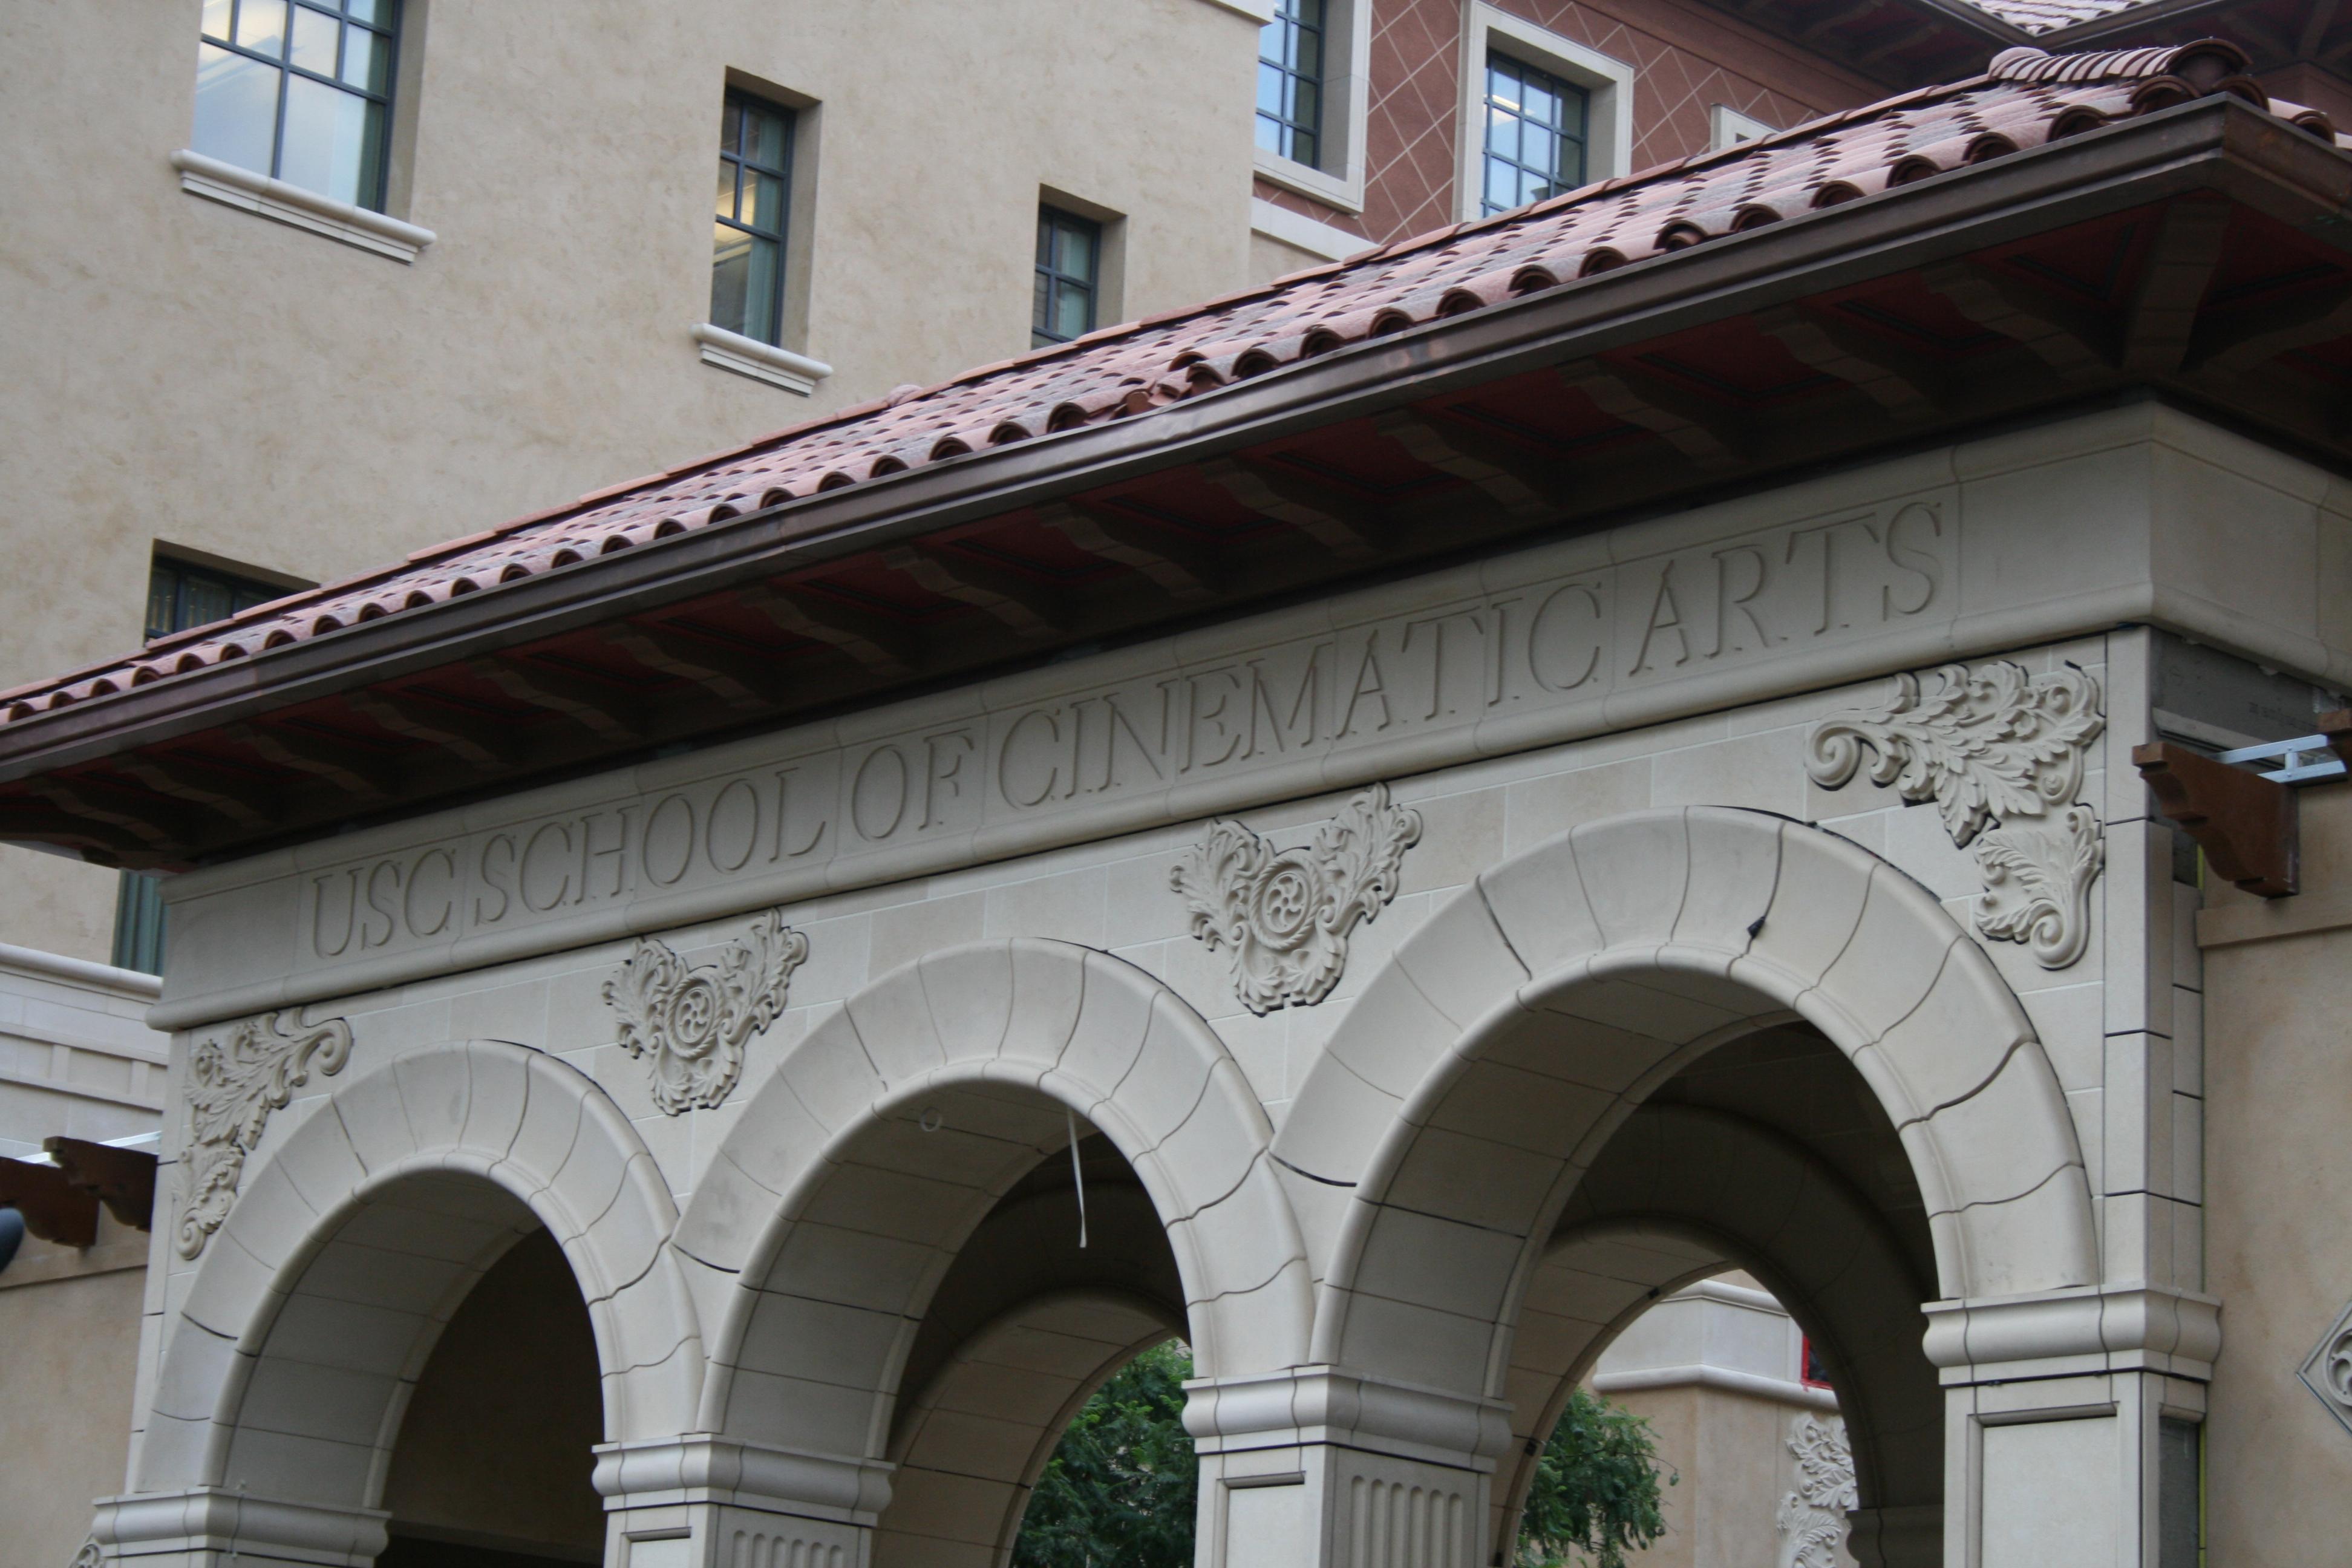 USC George Lucas 009